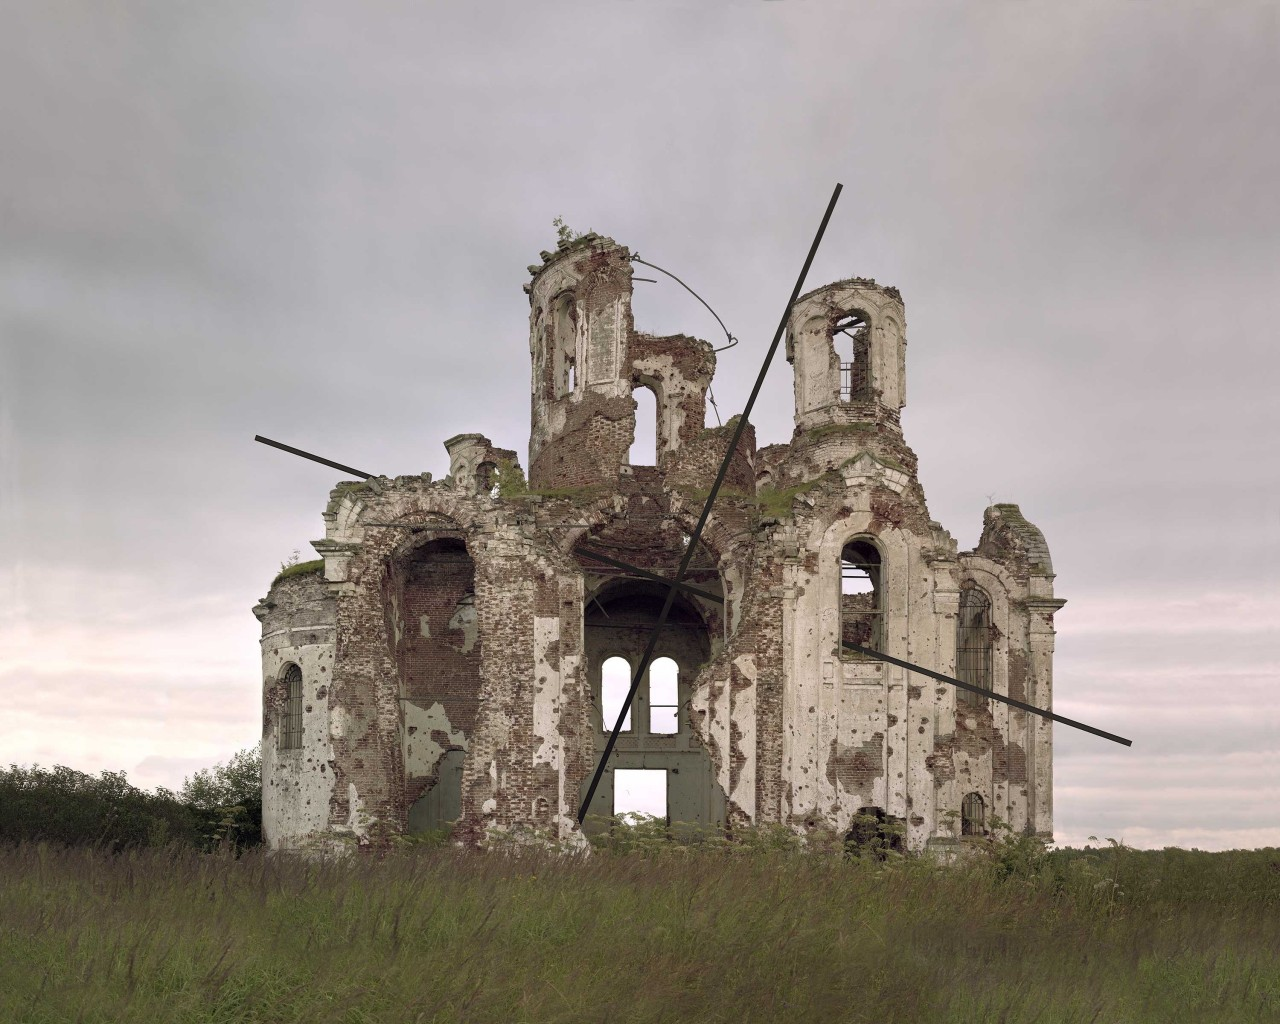 Монументы, 2017. Фотограф Данила Ткаченко